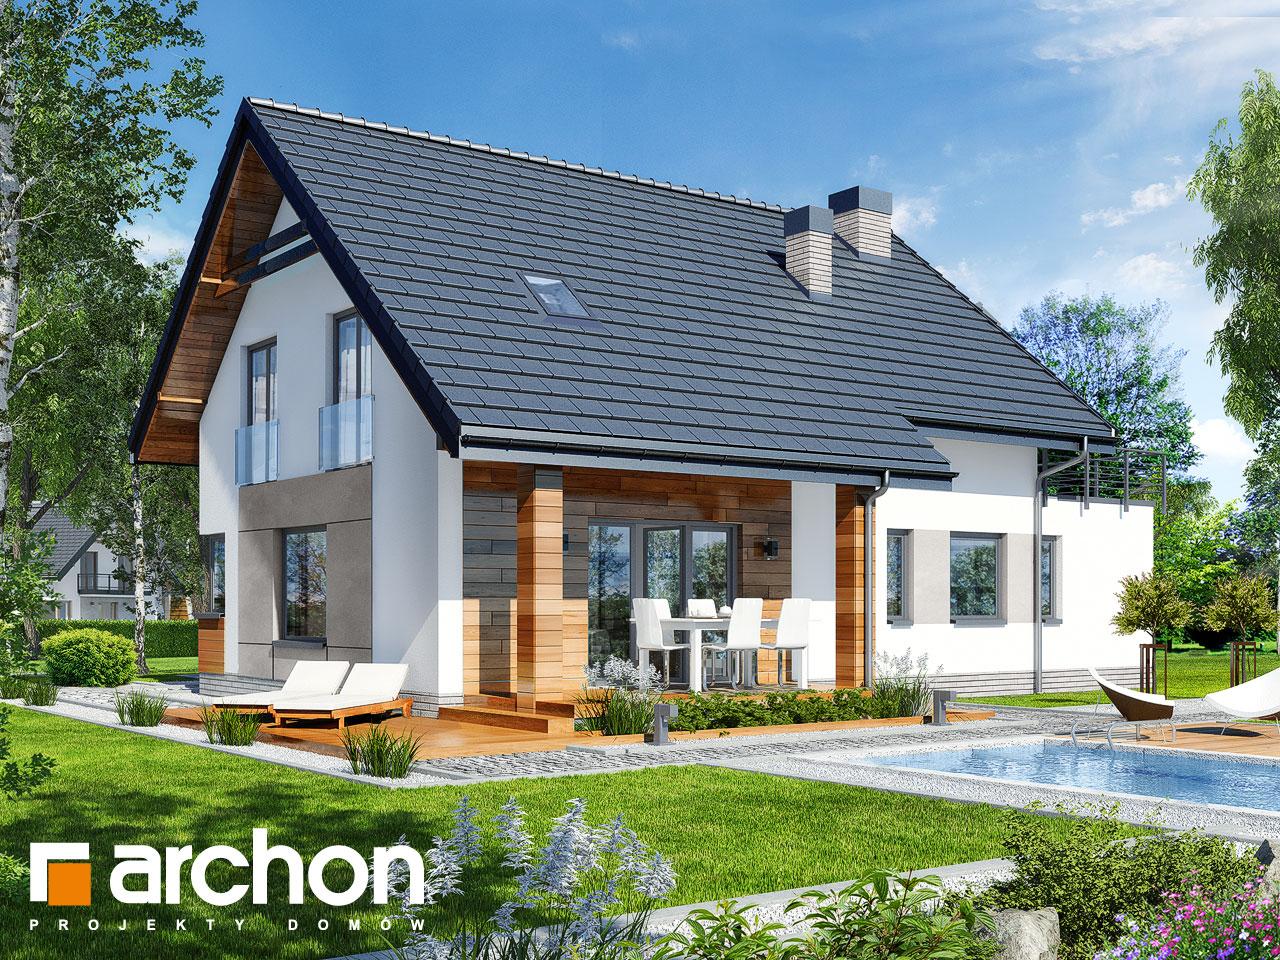 Проект будинку ARCHON+ Будинок в яблонках 8 (Г2) Вид 2